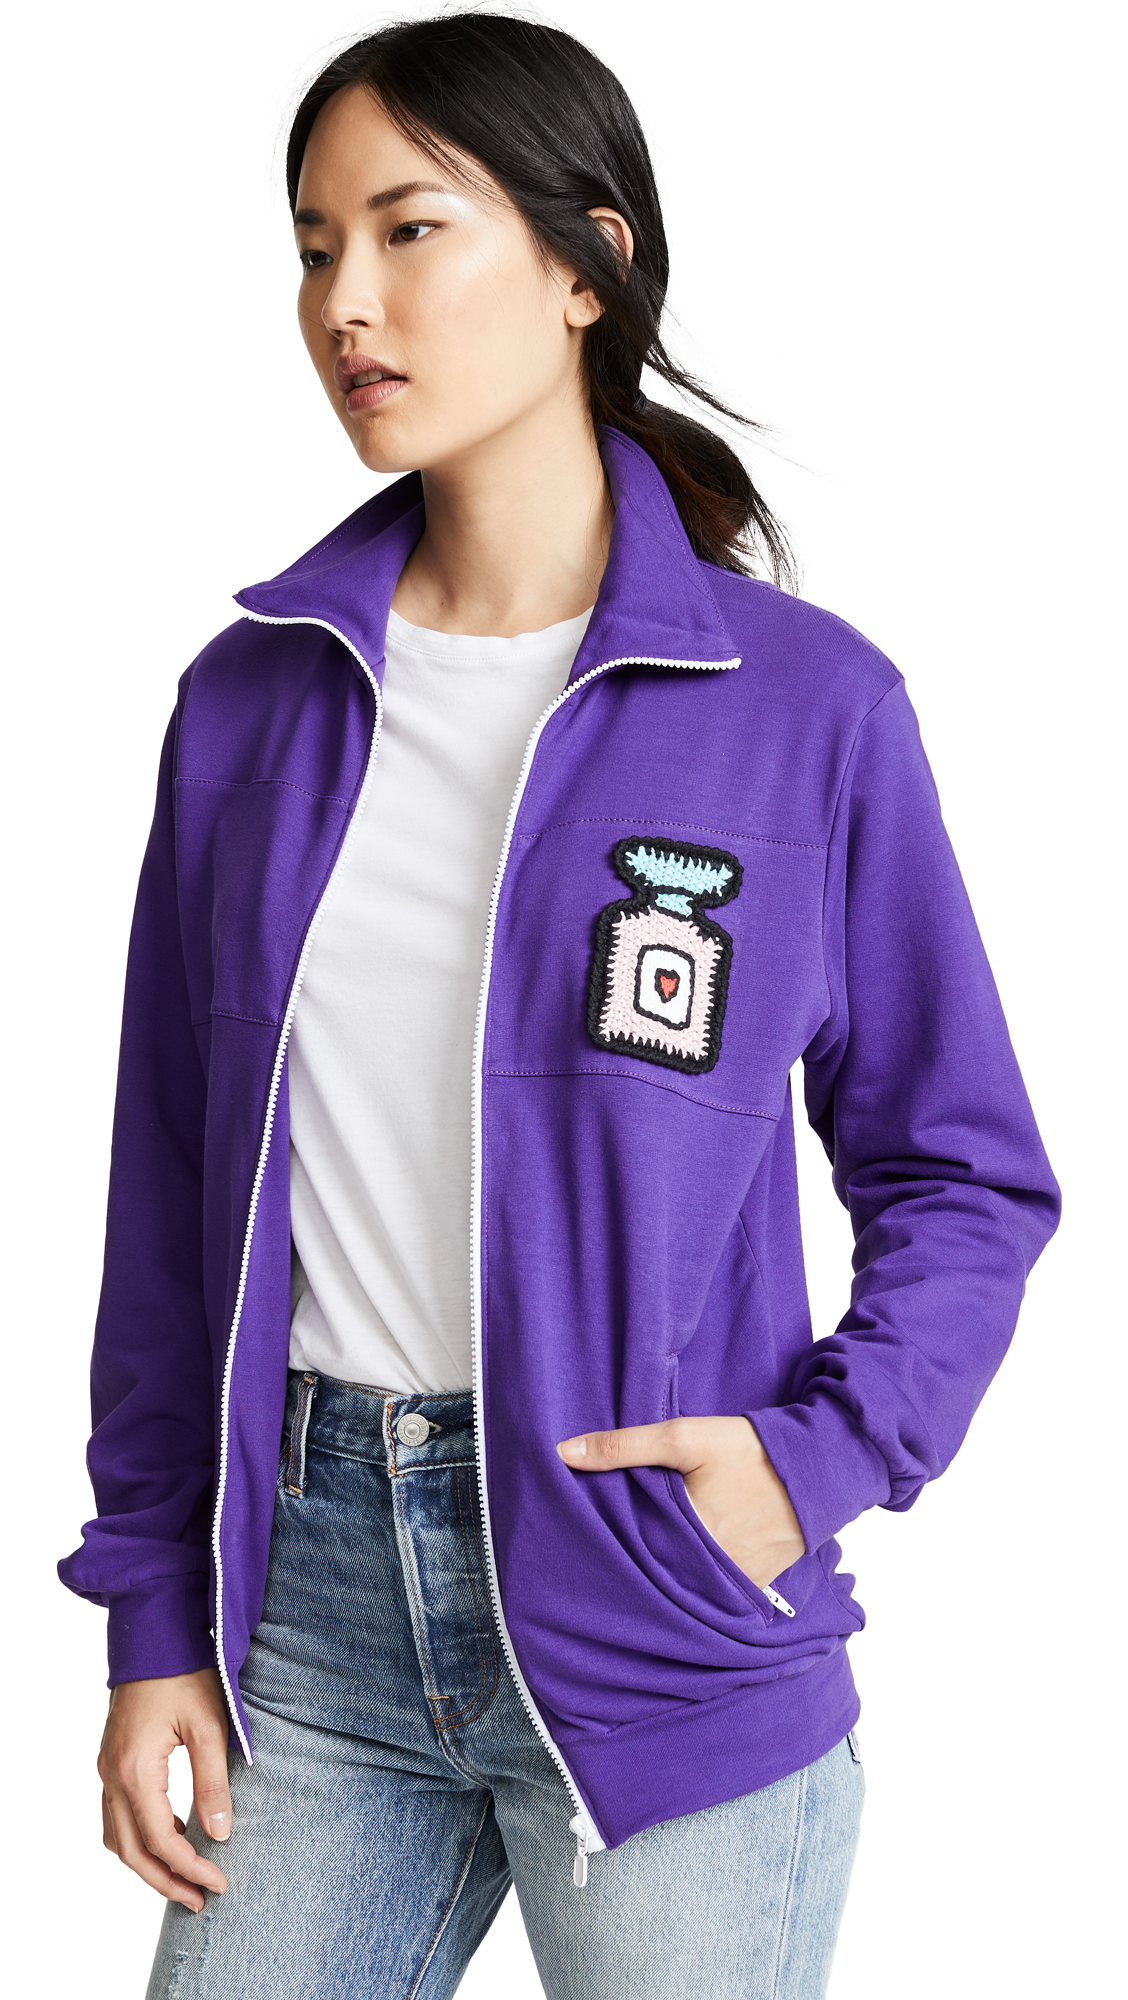 MICHAELA BUERGER Collared Jacket in Purple